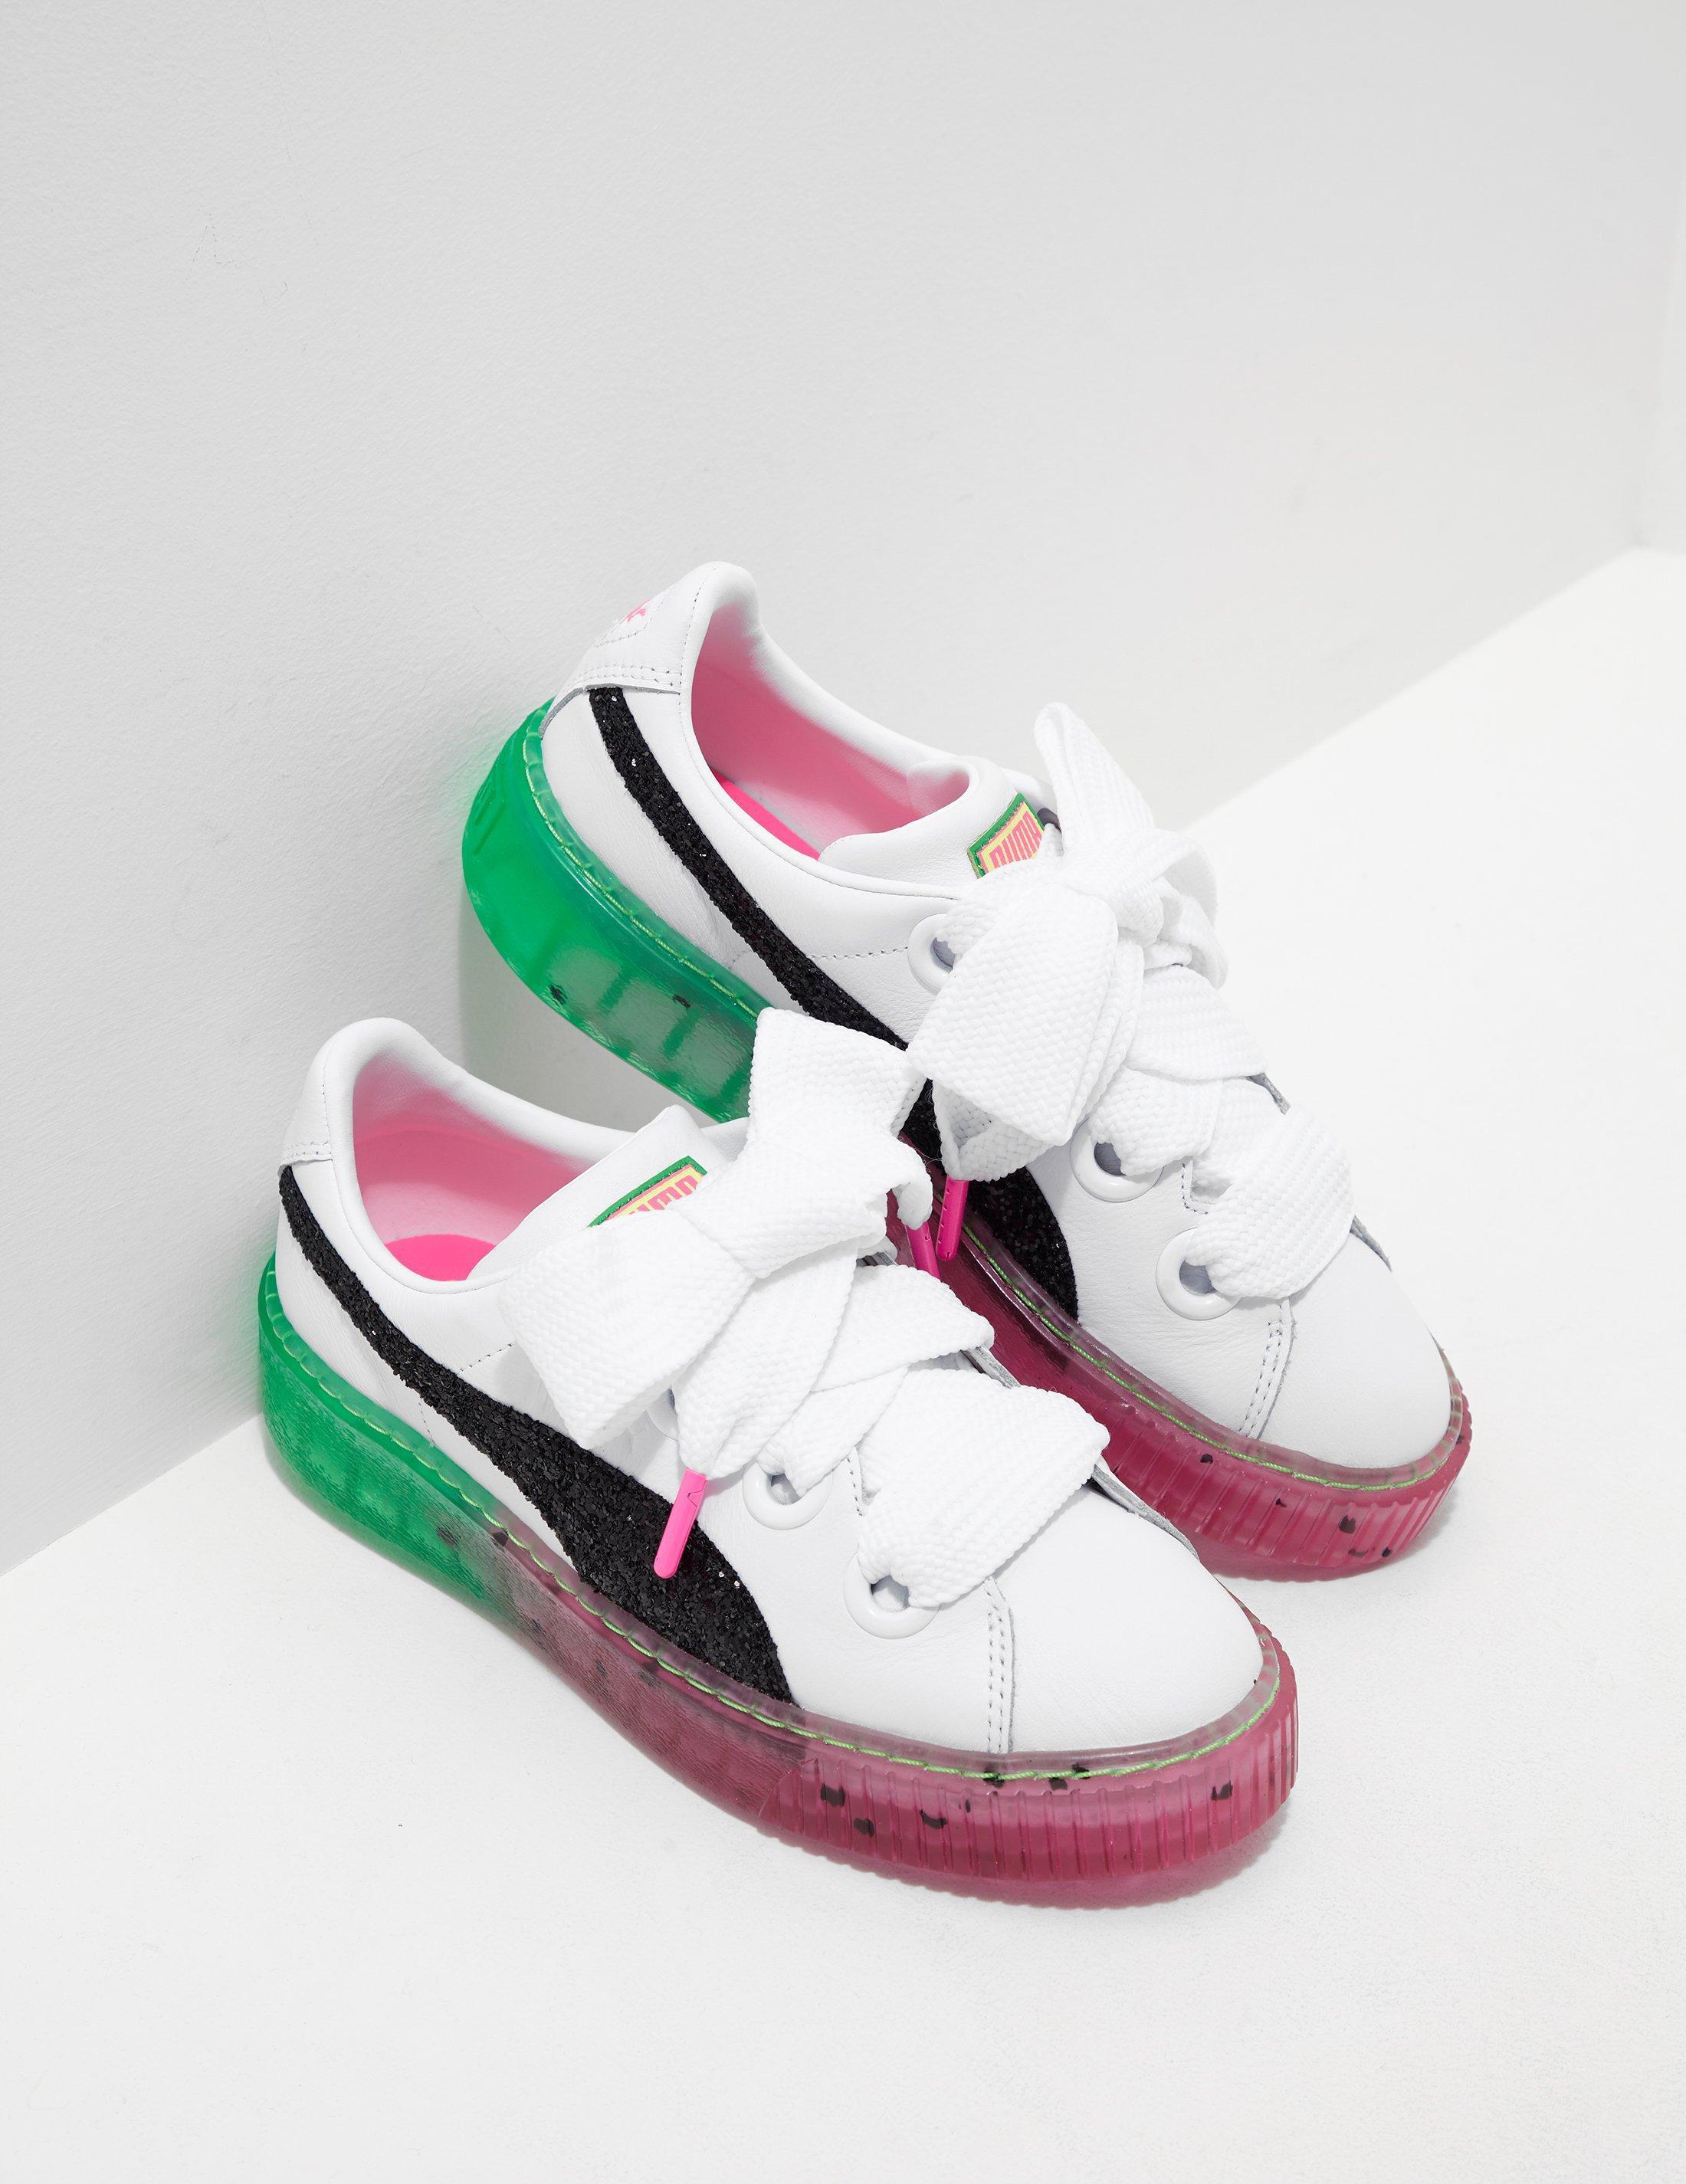 5f15fd1af8ed Lyst - PUMA Womens X Sophia Webster Platform Candy Princess Trainers ...